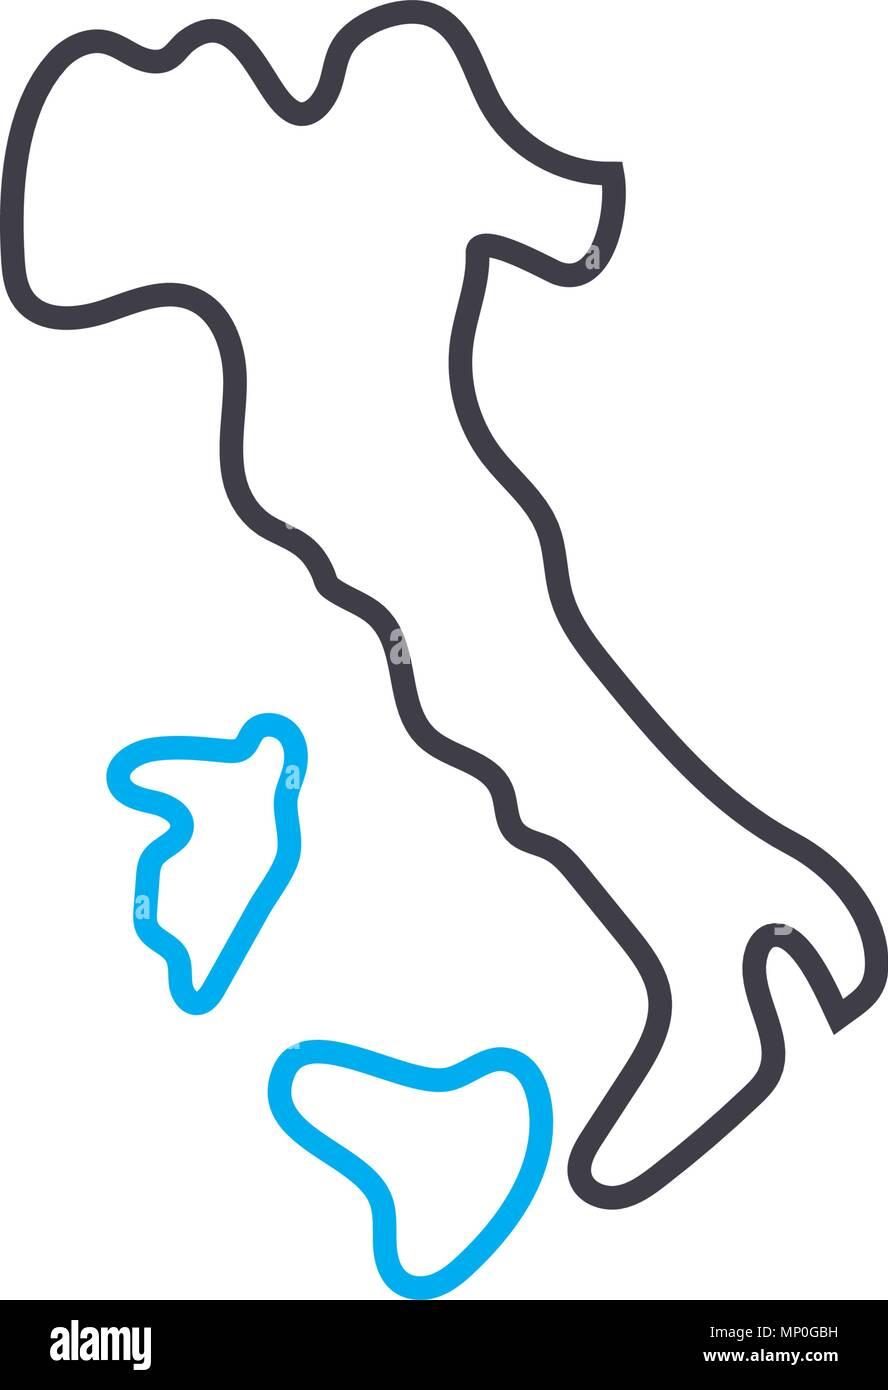 Apennine peninsula linear icon concept. Apennine peninsula line vector sign, symbol, illustration. - Stock Vector